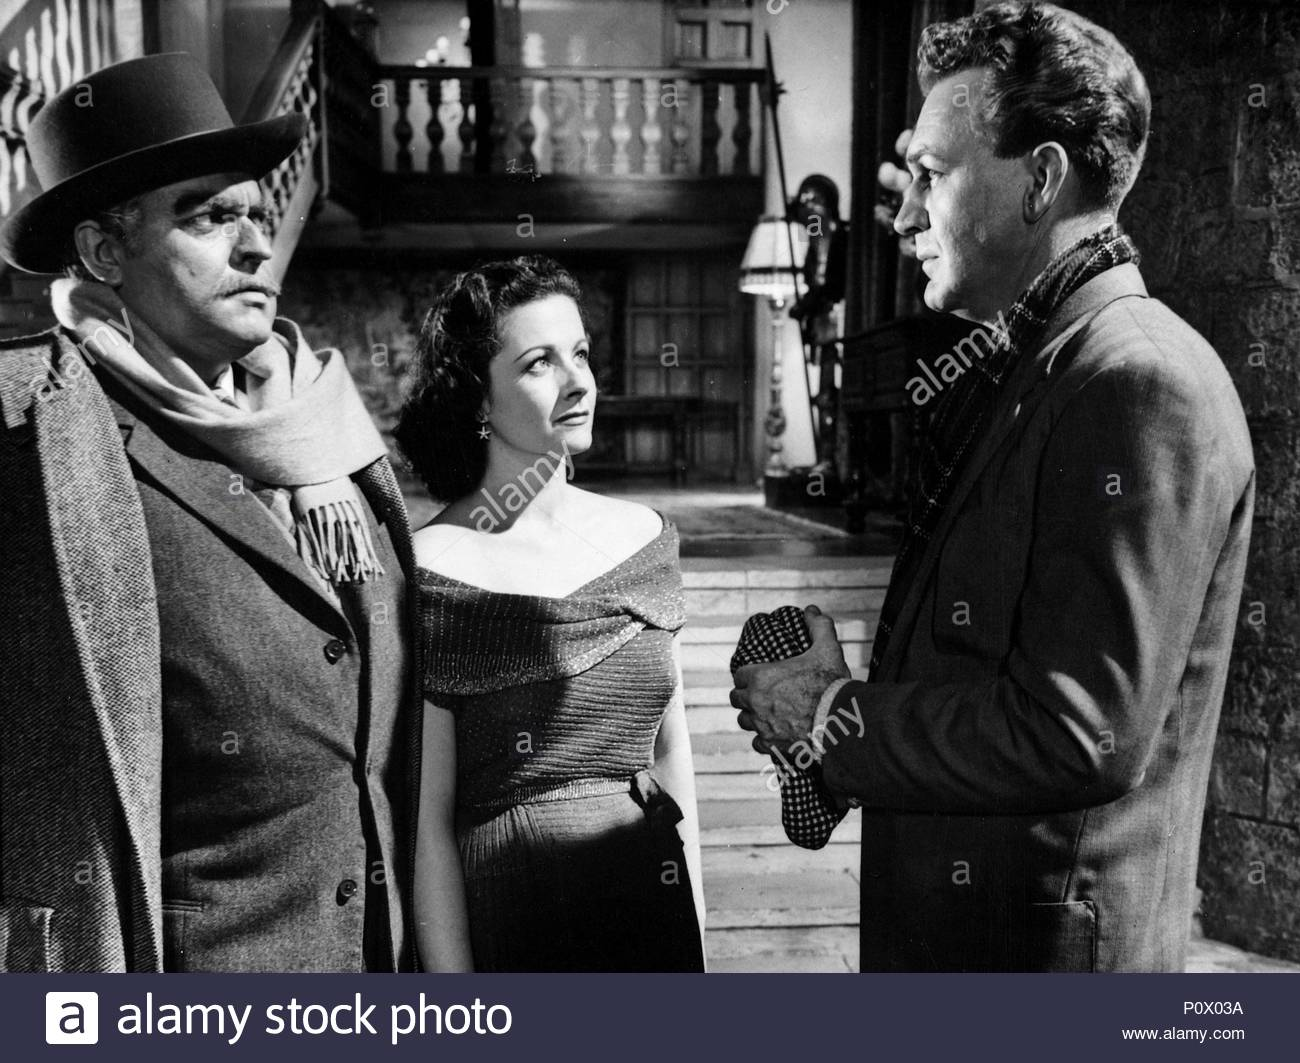 Original Film Title: TROUBLE IN THE GLEN.  English Title: TROUBLE IN THE GLEN.  Film Director: HERBERT WILCOX.  Year: 1954.  Stars: ORSON WELLES; MARGARET LOCKWOOD; FORREST TUCKER. Credit: REPUBLIC PICTURES / Album - Stock Image